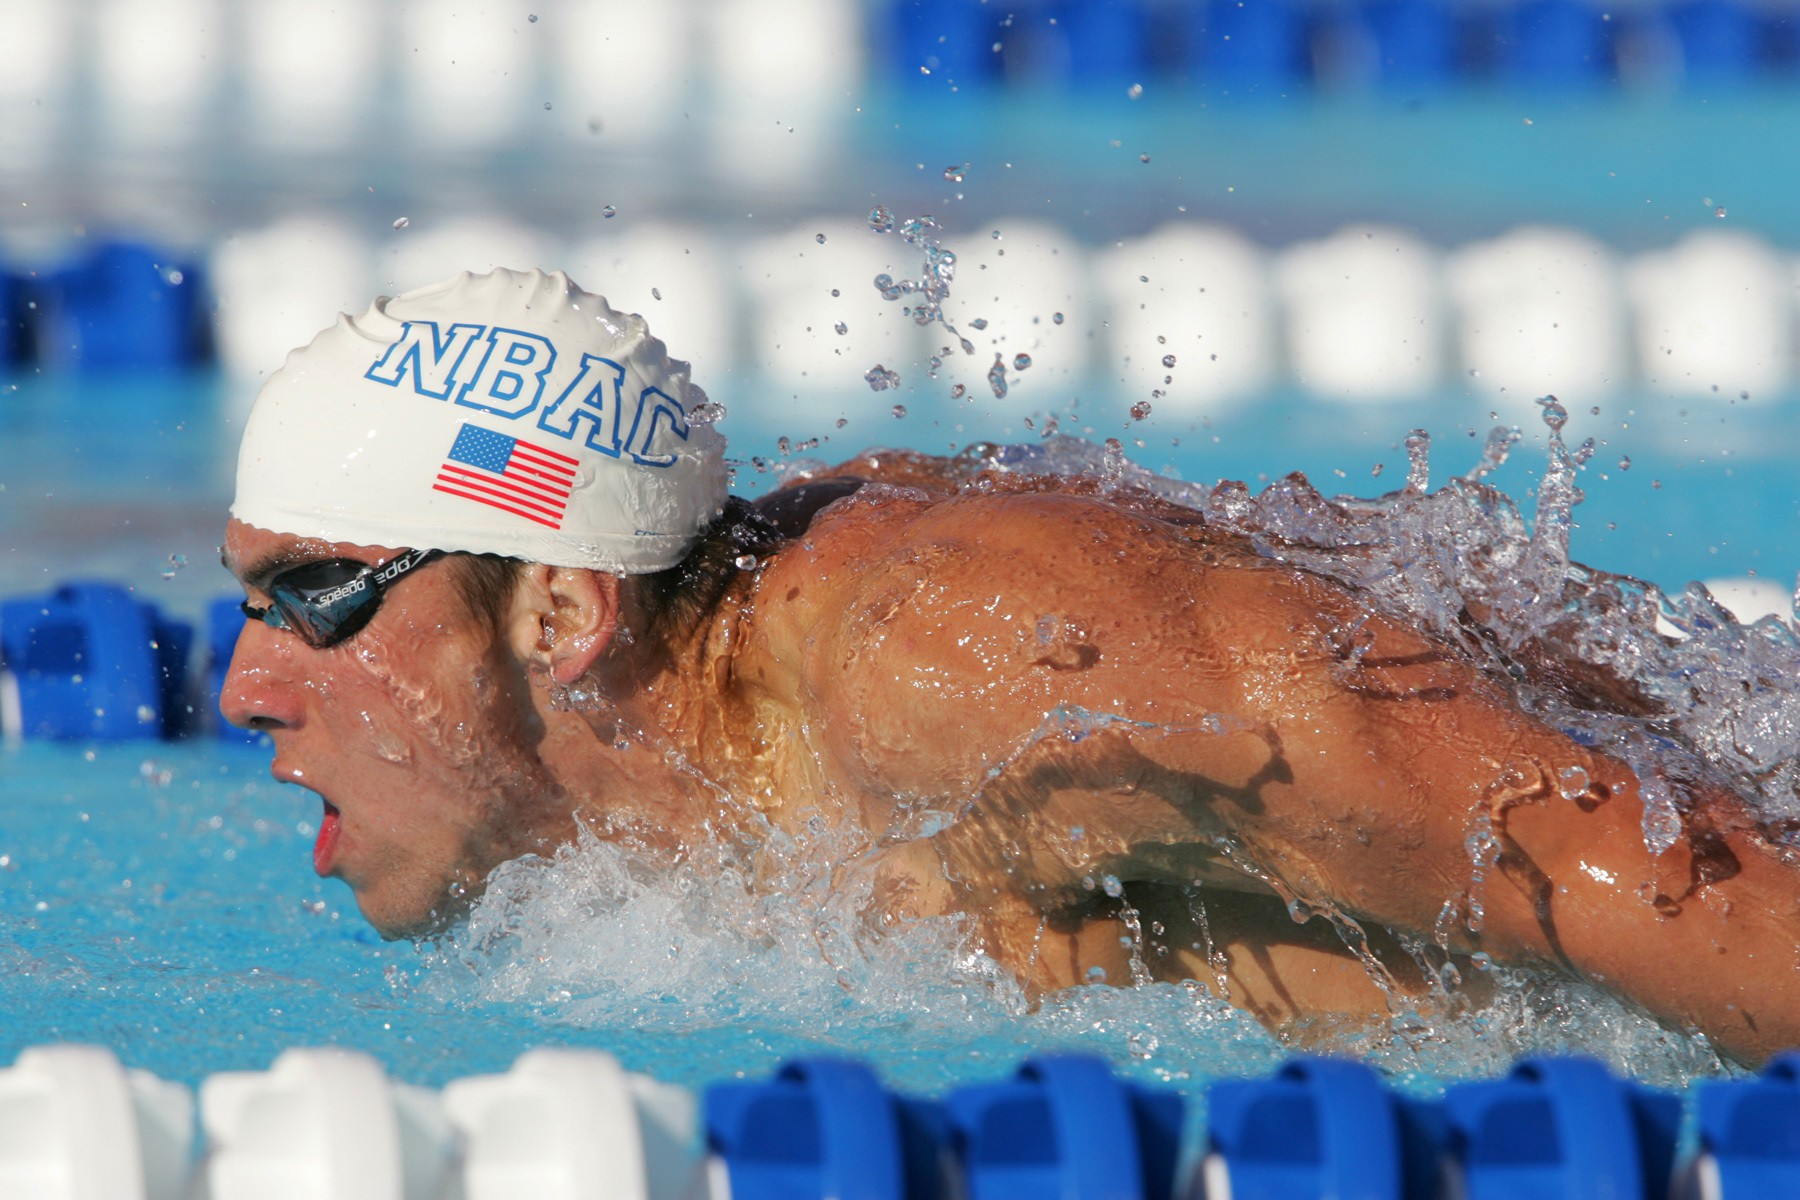 1swimming_michael_phelps